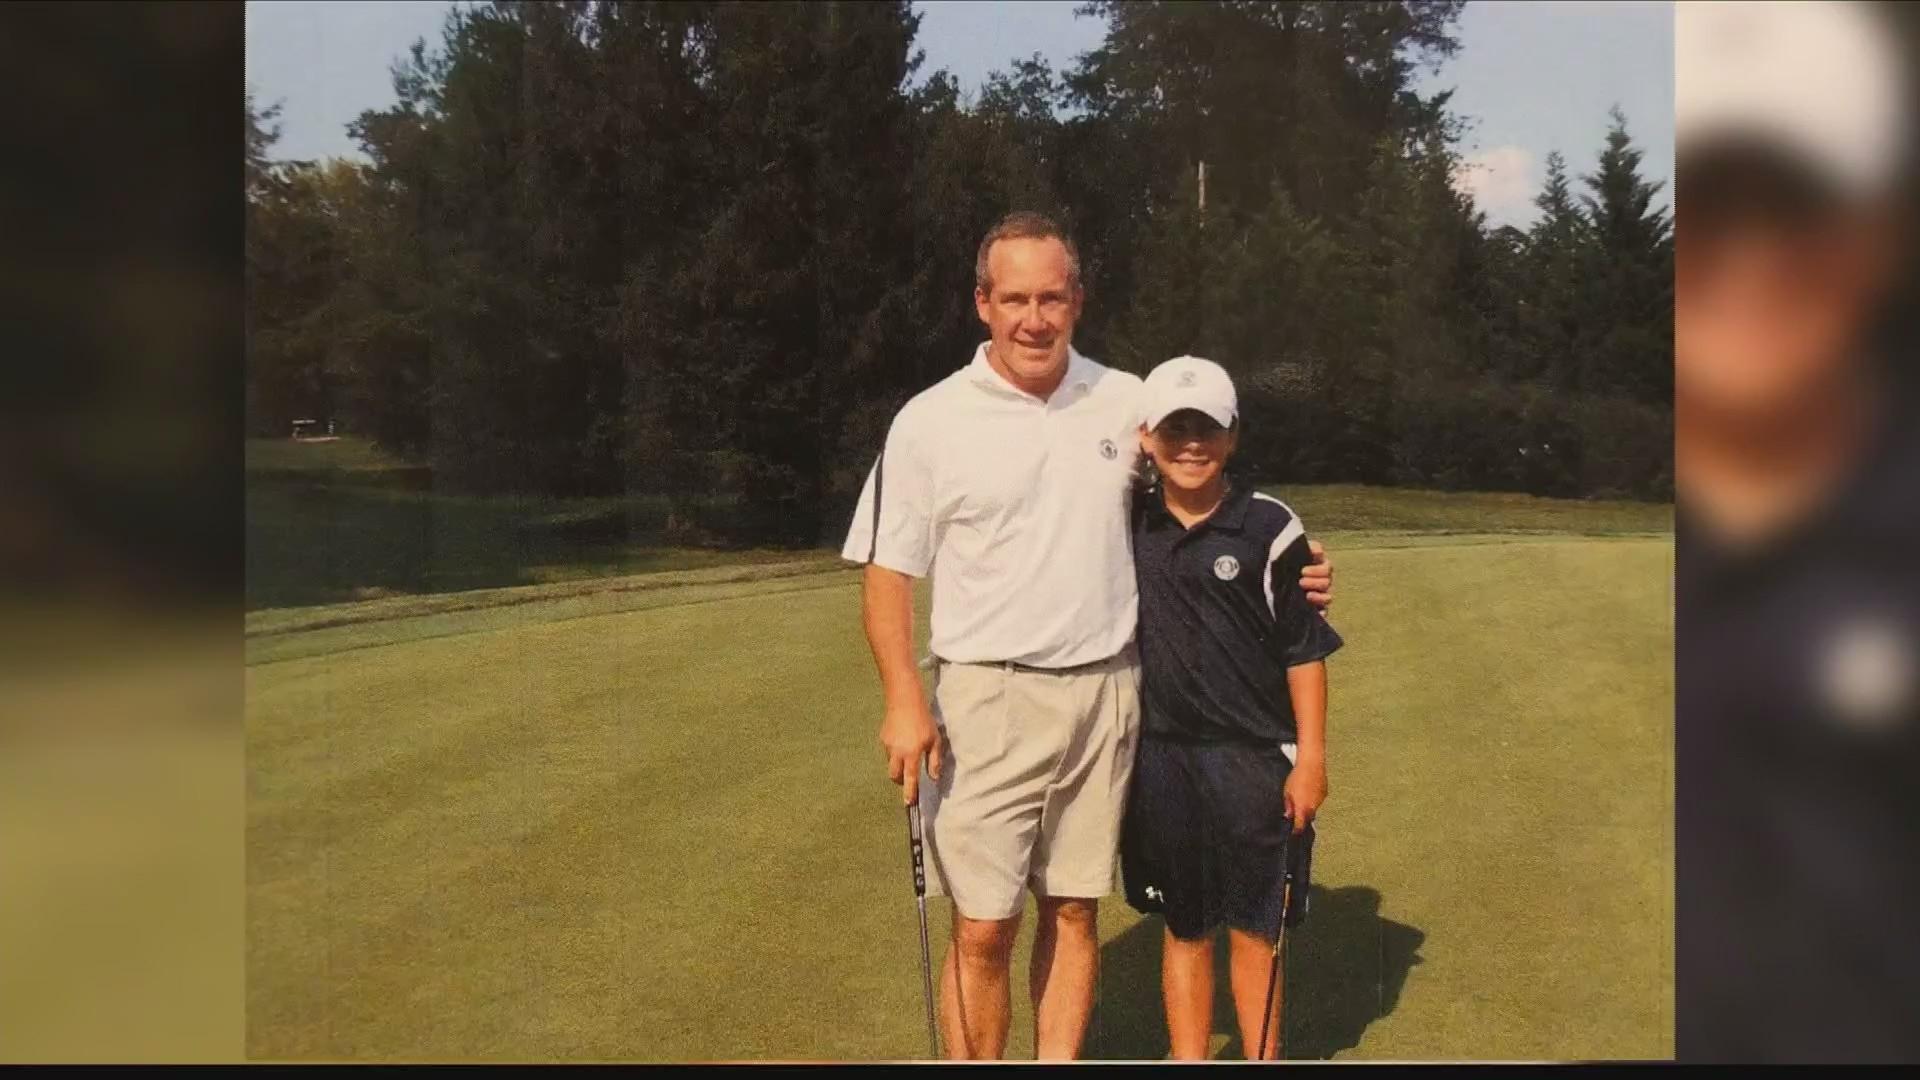 Tee Time Augusta: Psu Altoona Golfer Perseveres Through The For Penn State Altoona School Calendar